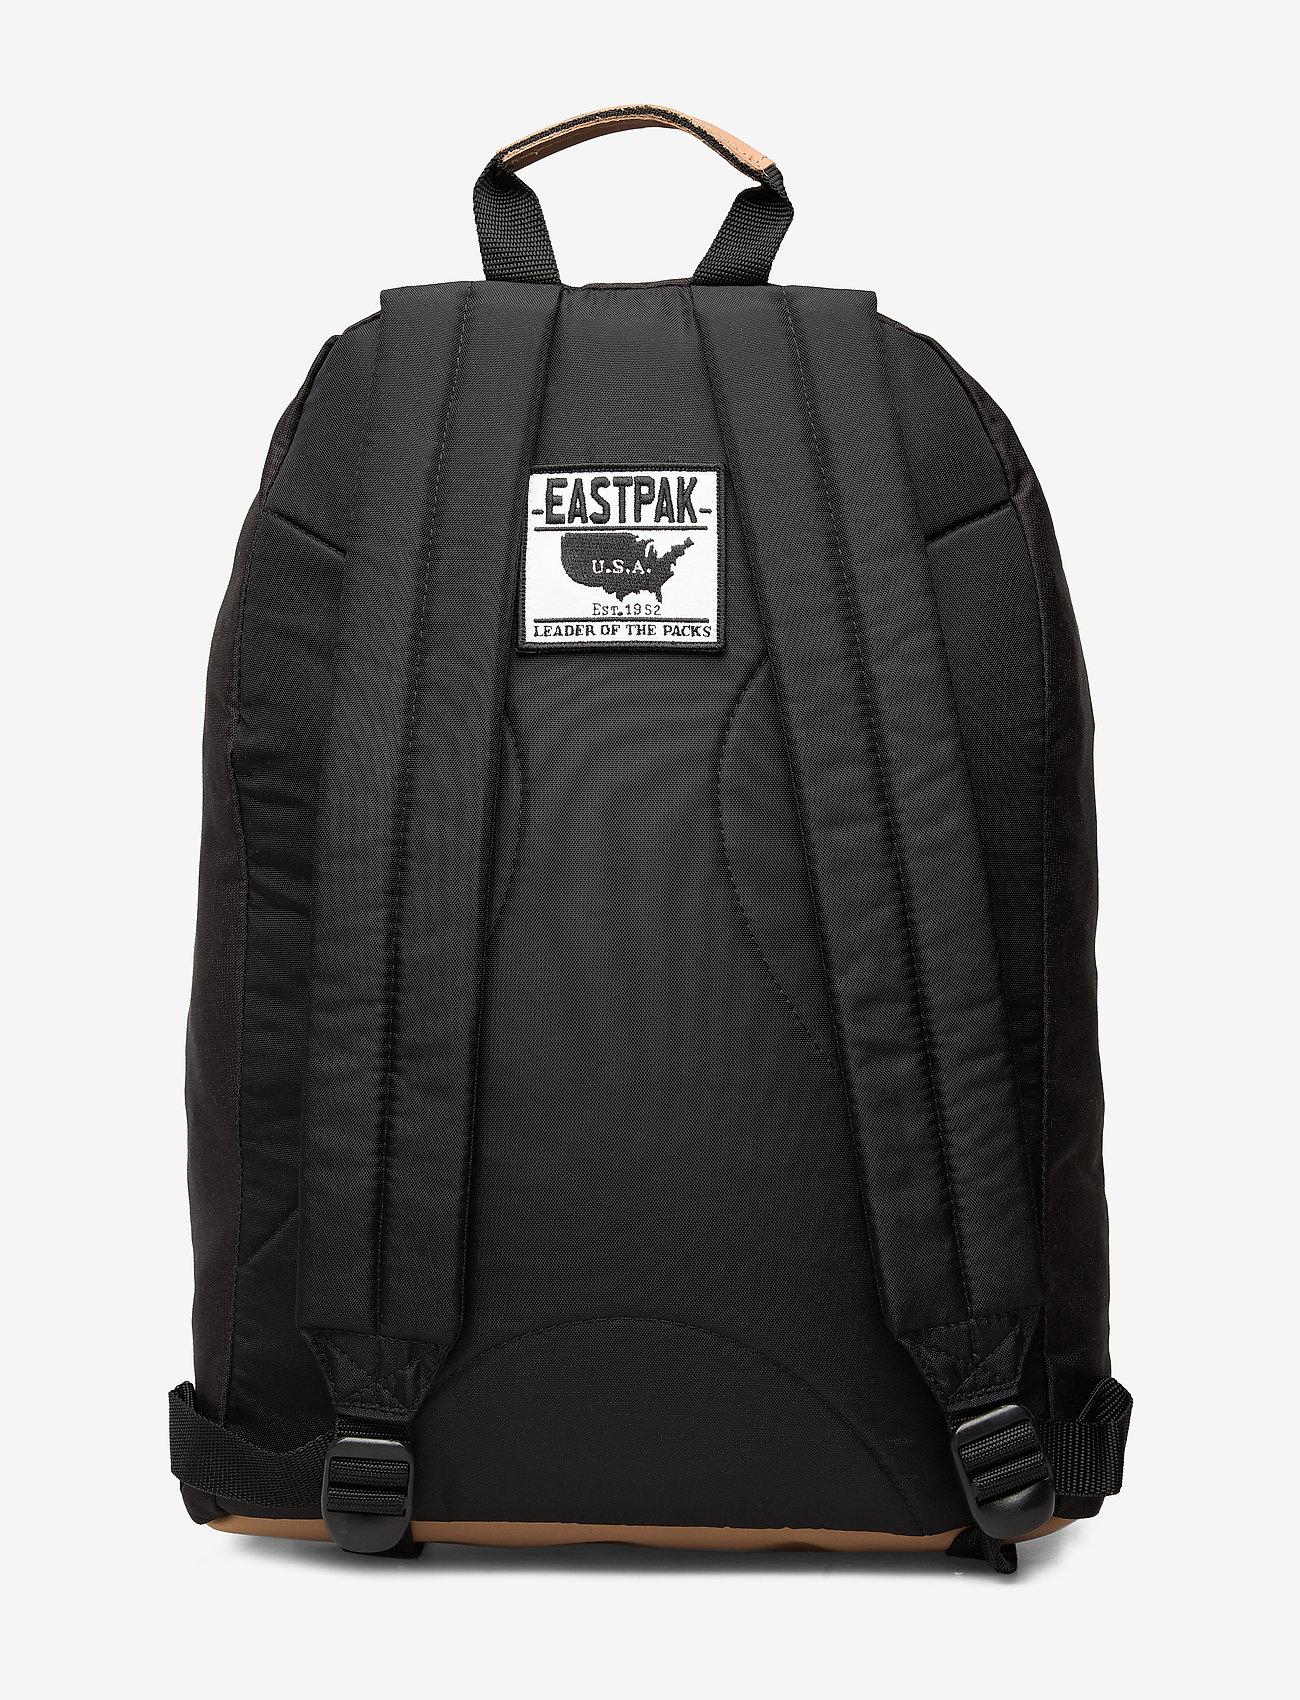 Eastpak - OUT OF OFFICE - rucksäcke - into black - 1